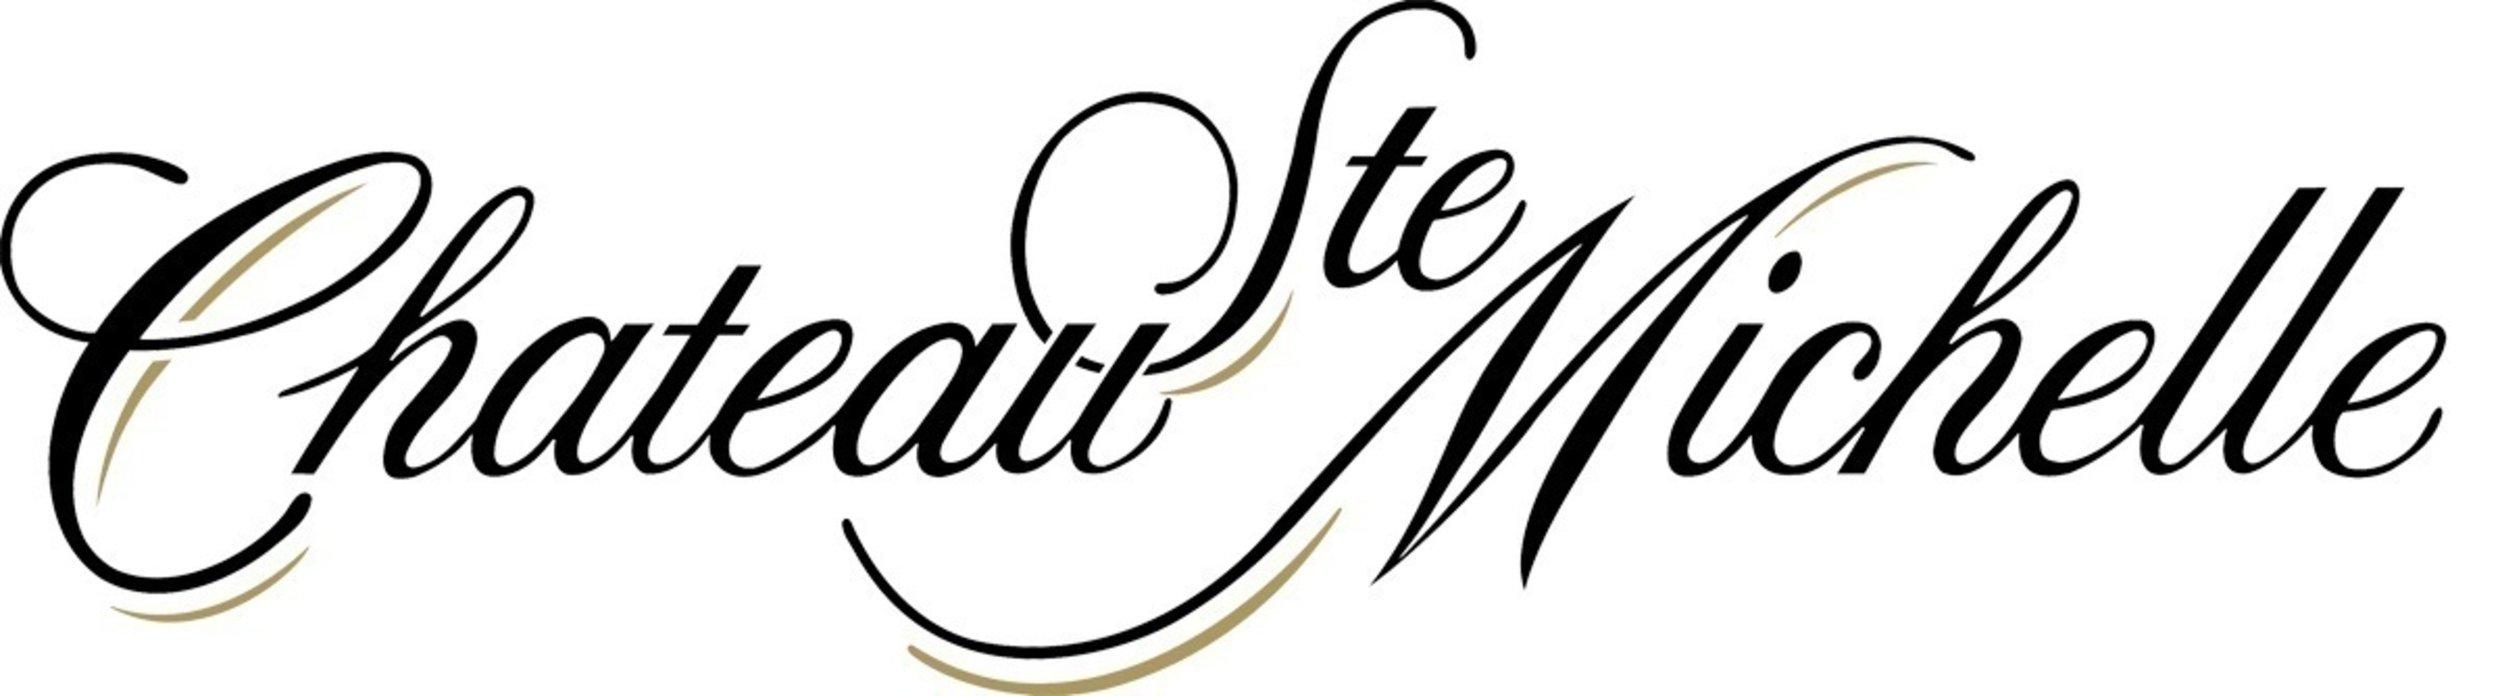 CSM Logo.jpeg